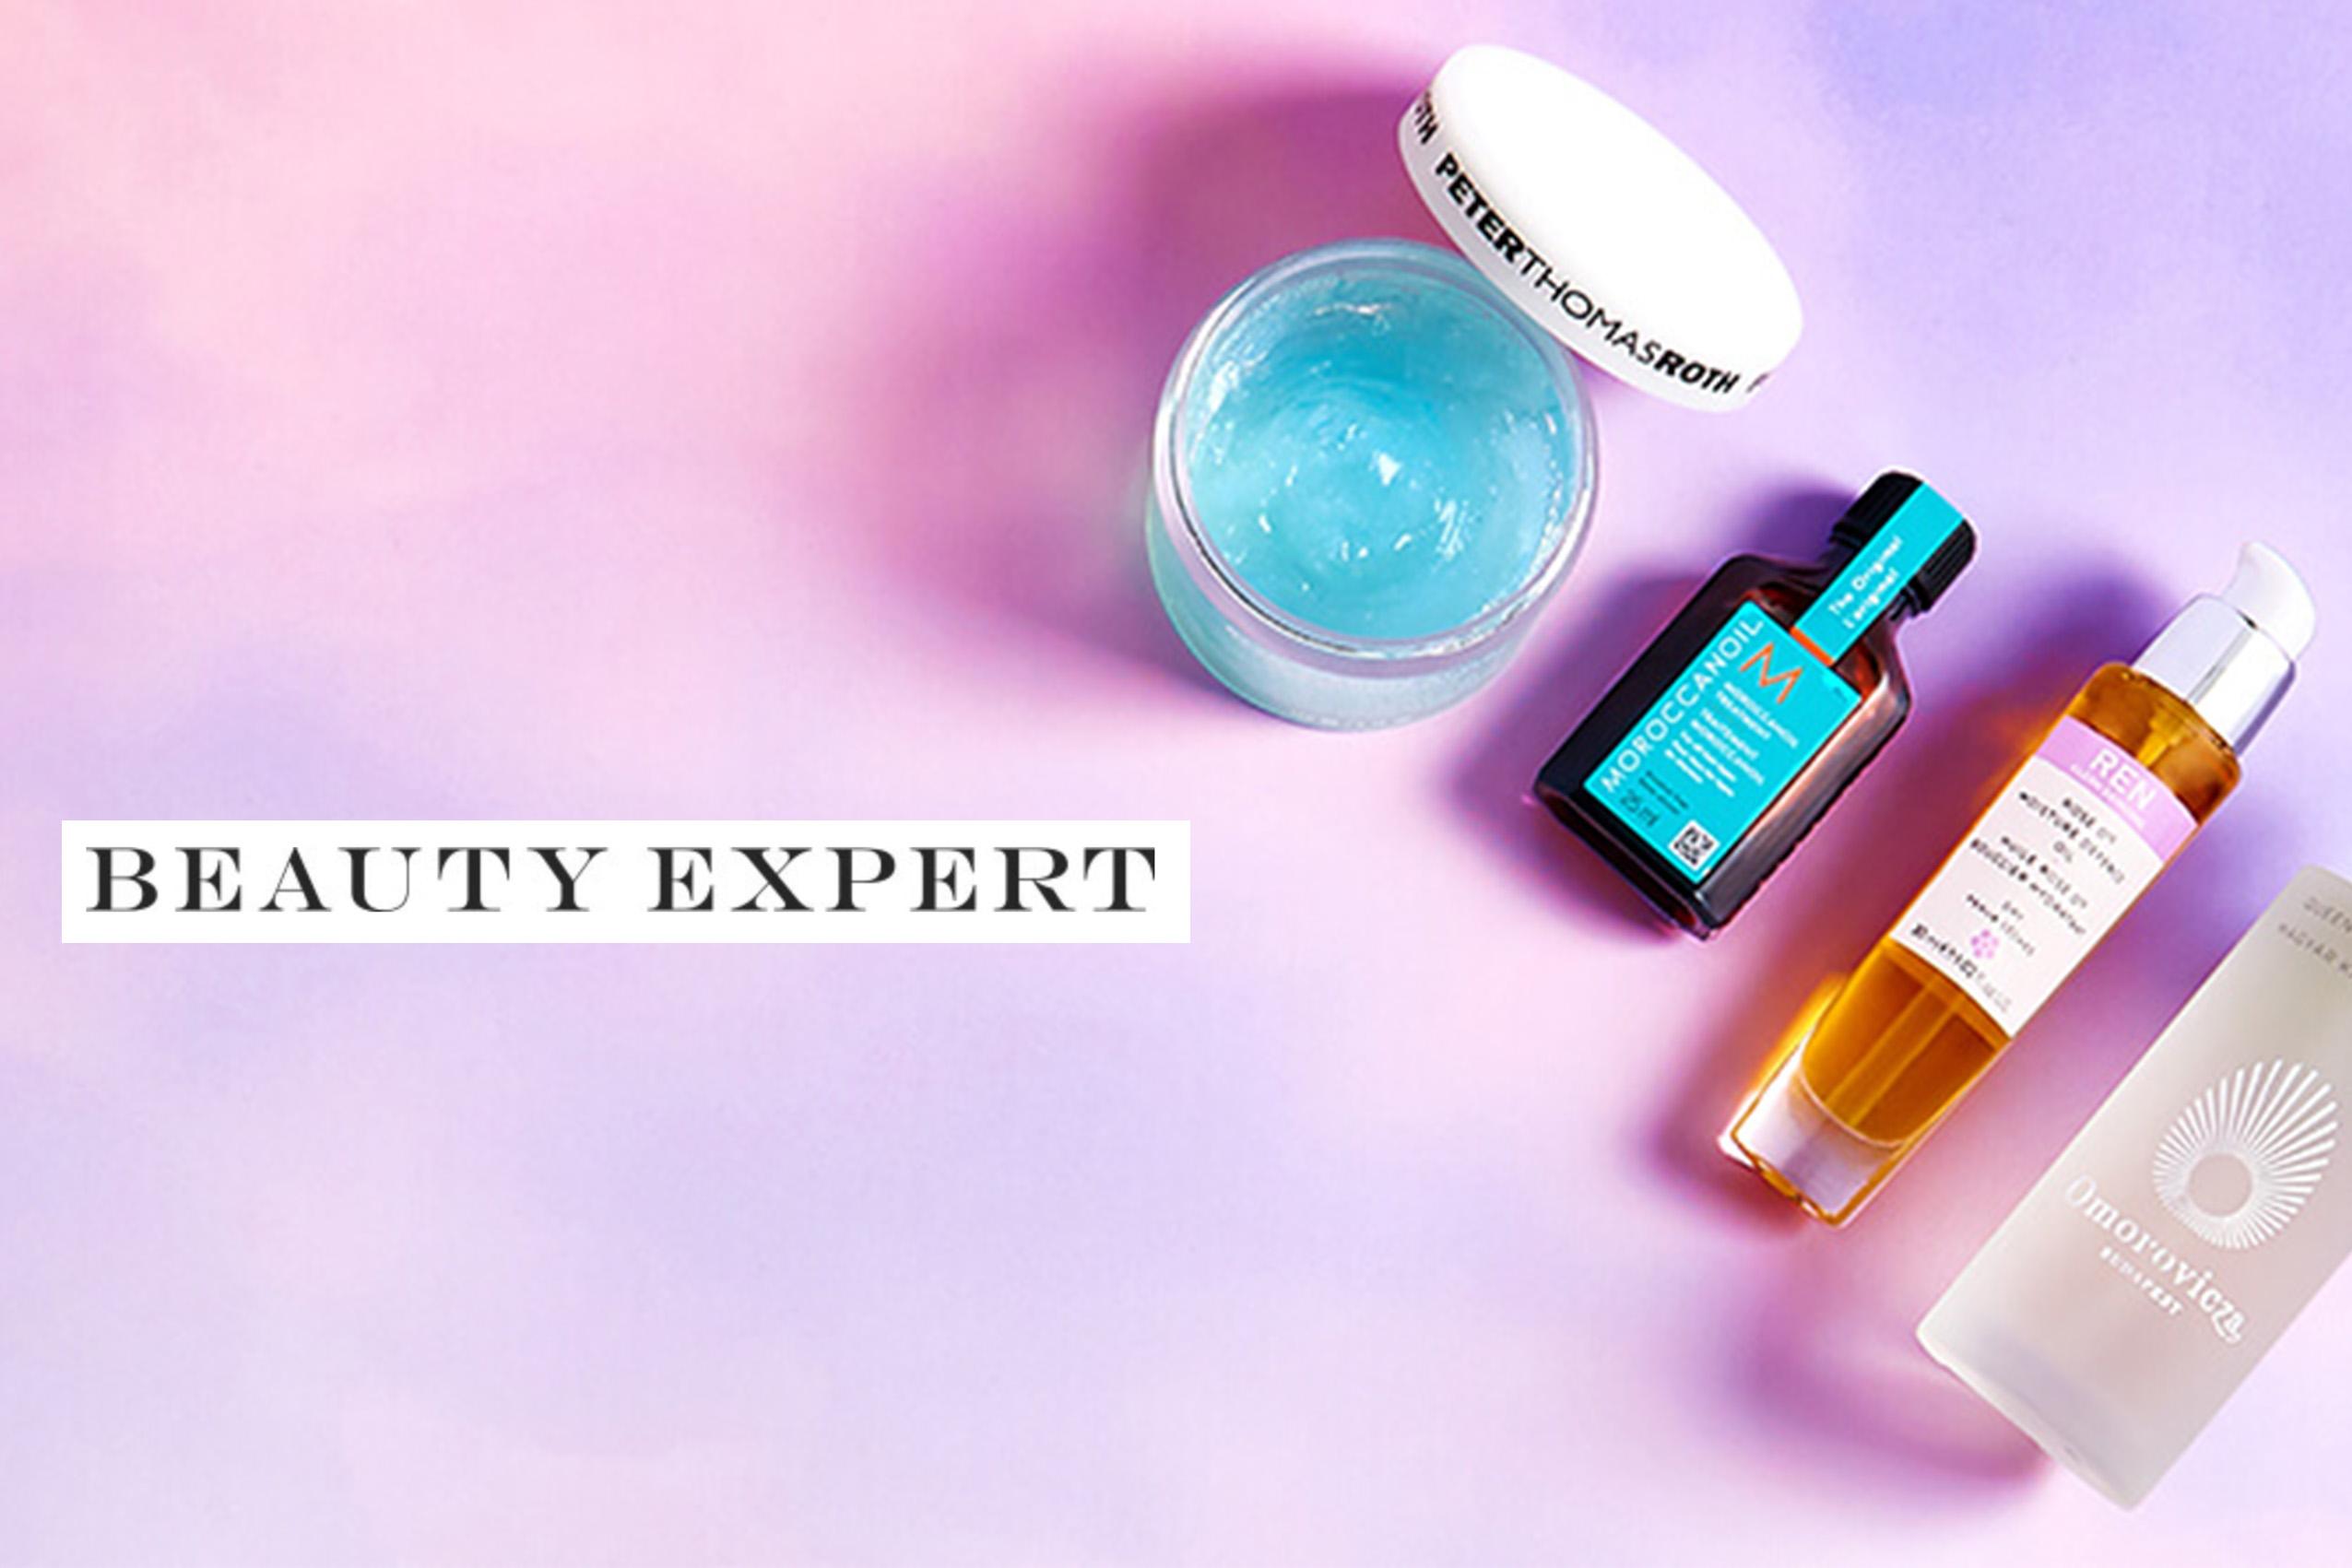 Beauty Expert夏日折扣高至20%OFF!Eve Lom,Jurlique,Lancôme等品牌一网打尽!